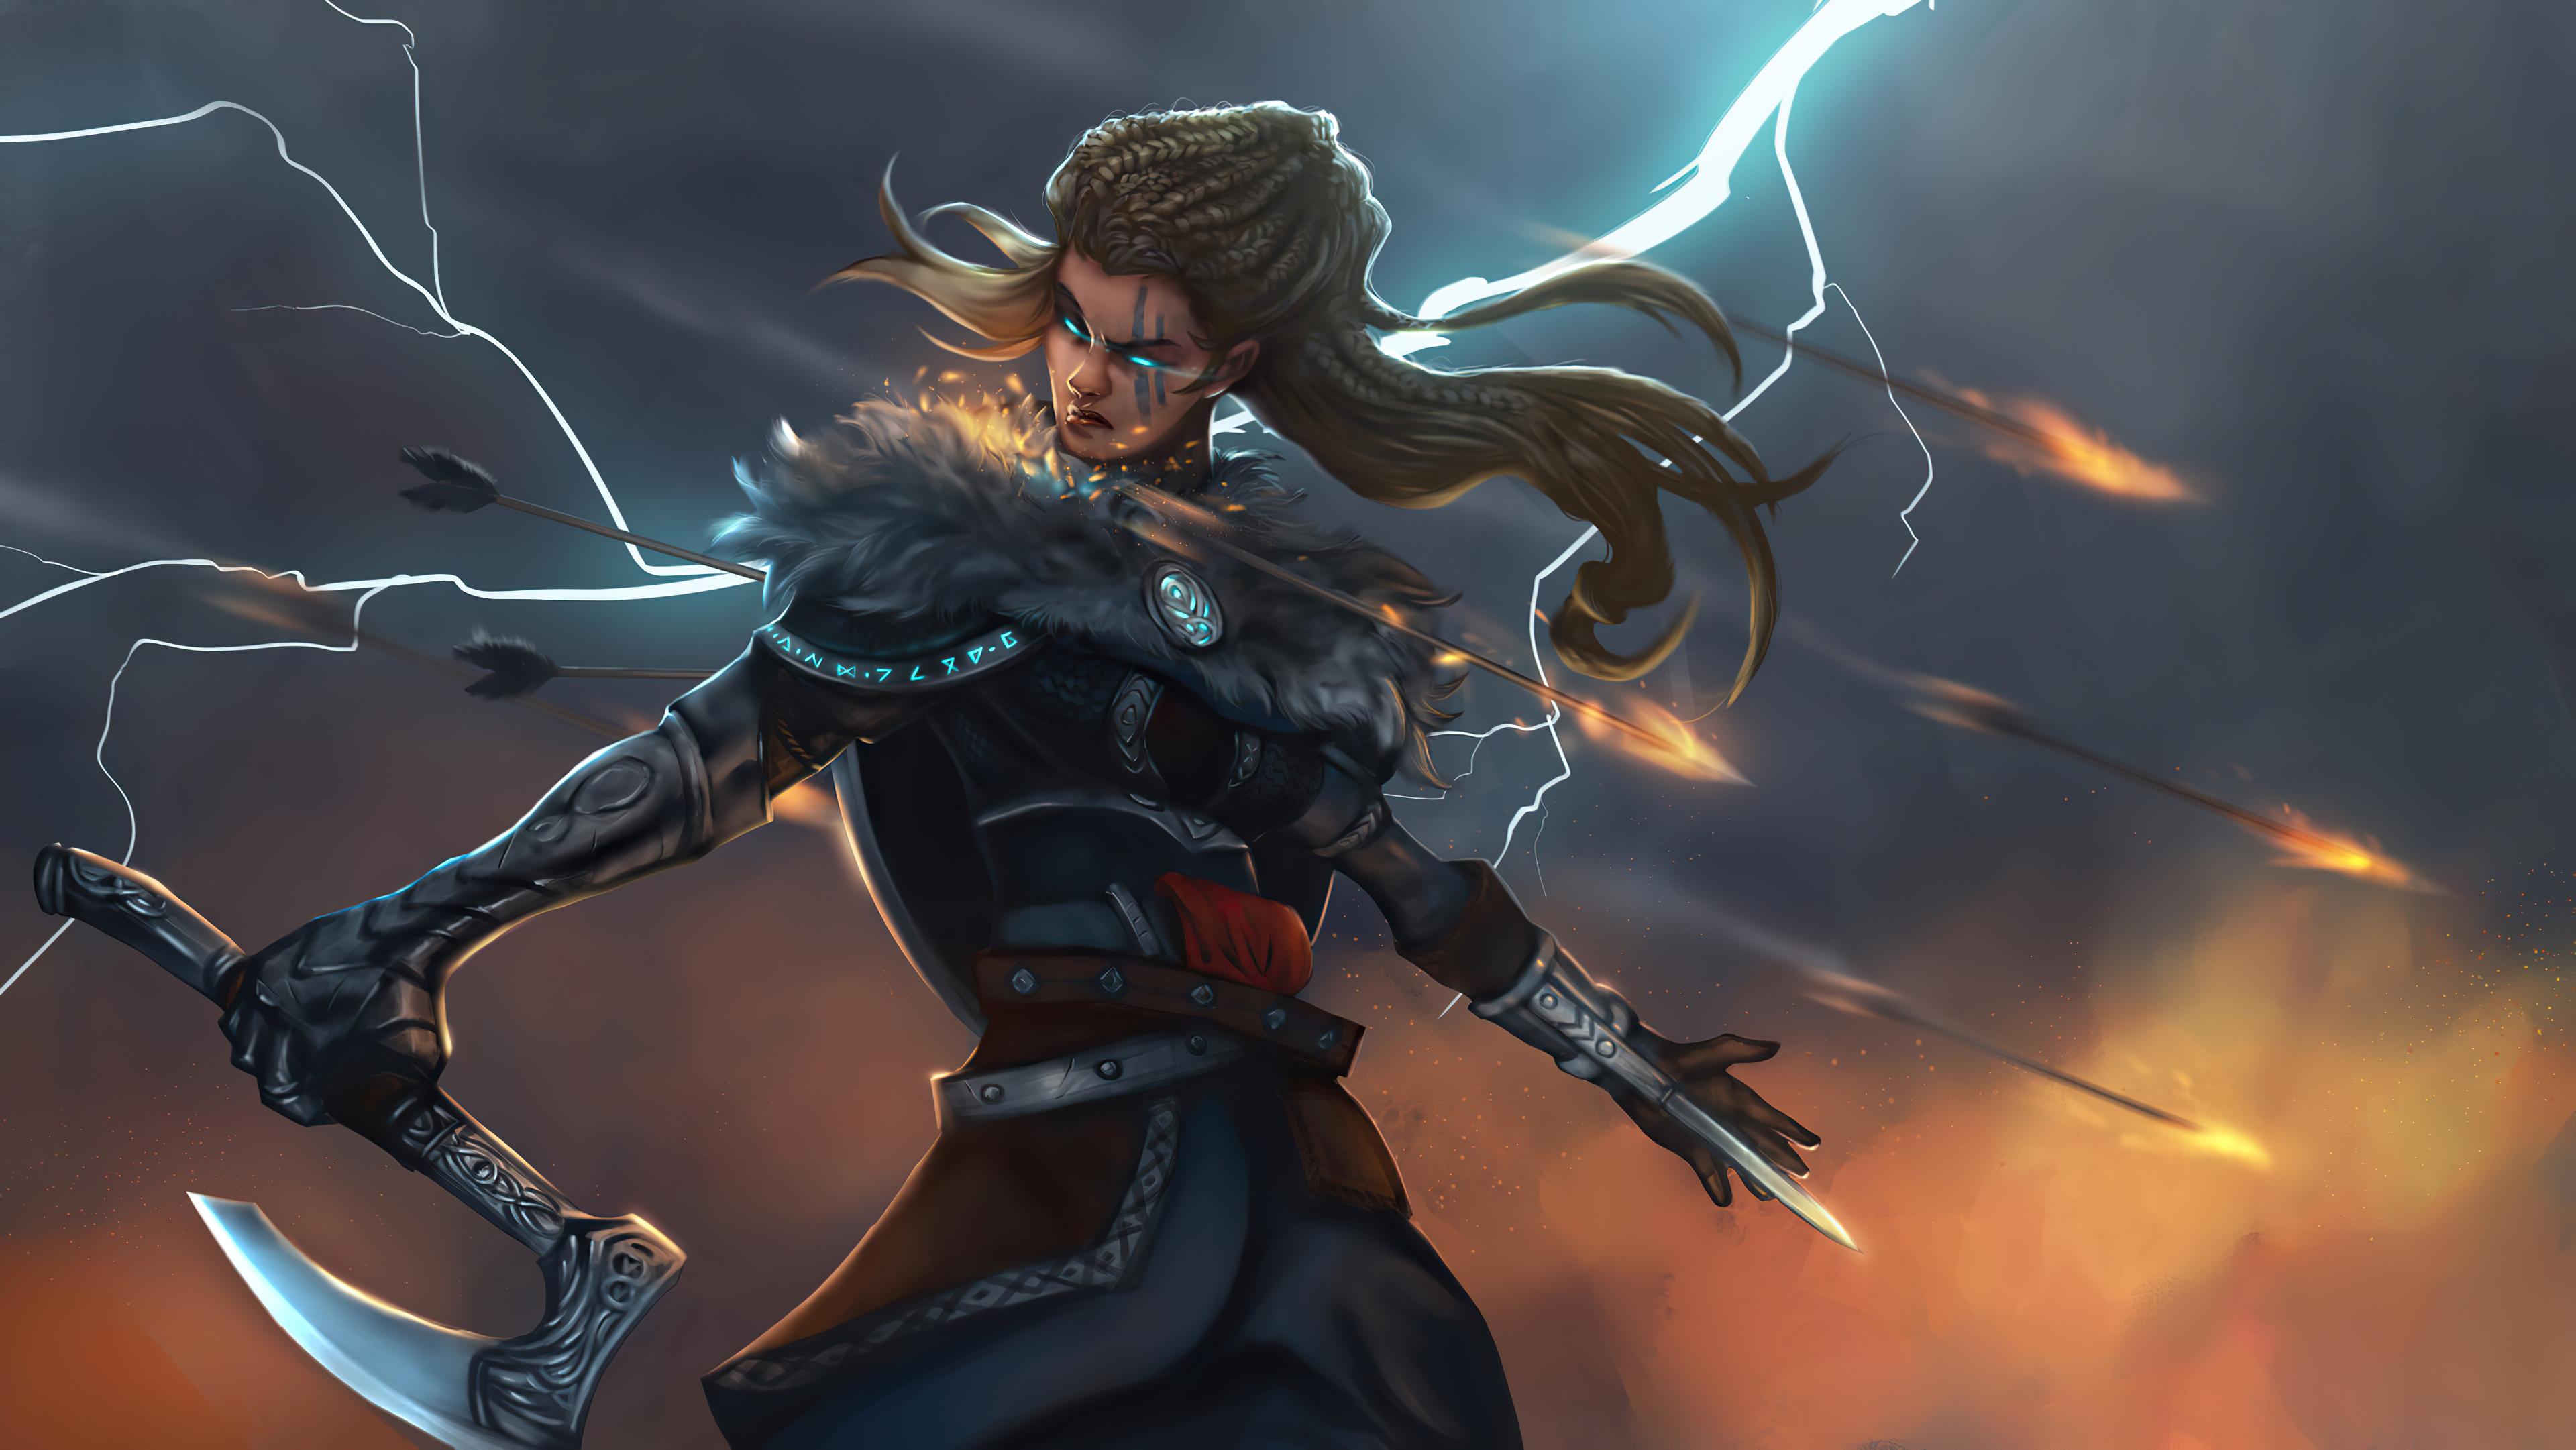 assassins creed valhalla female main character